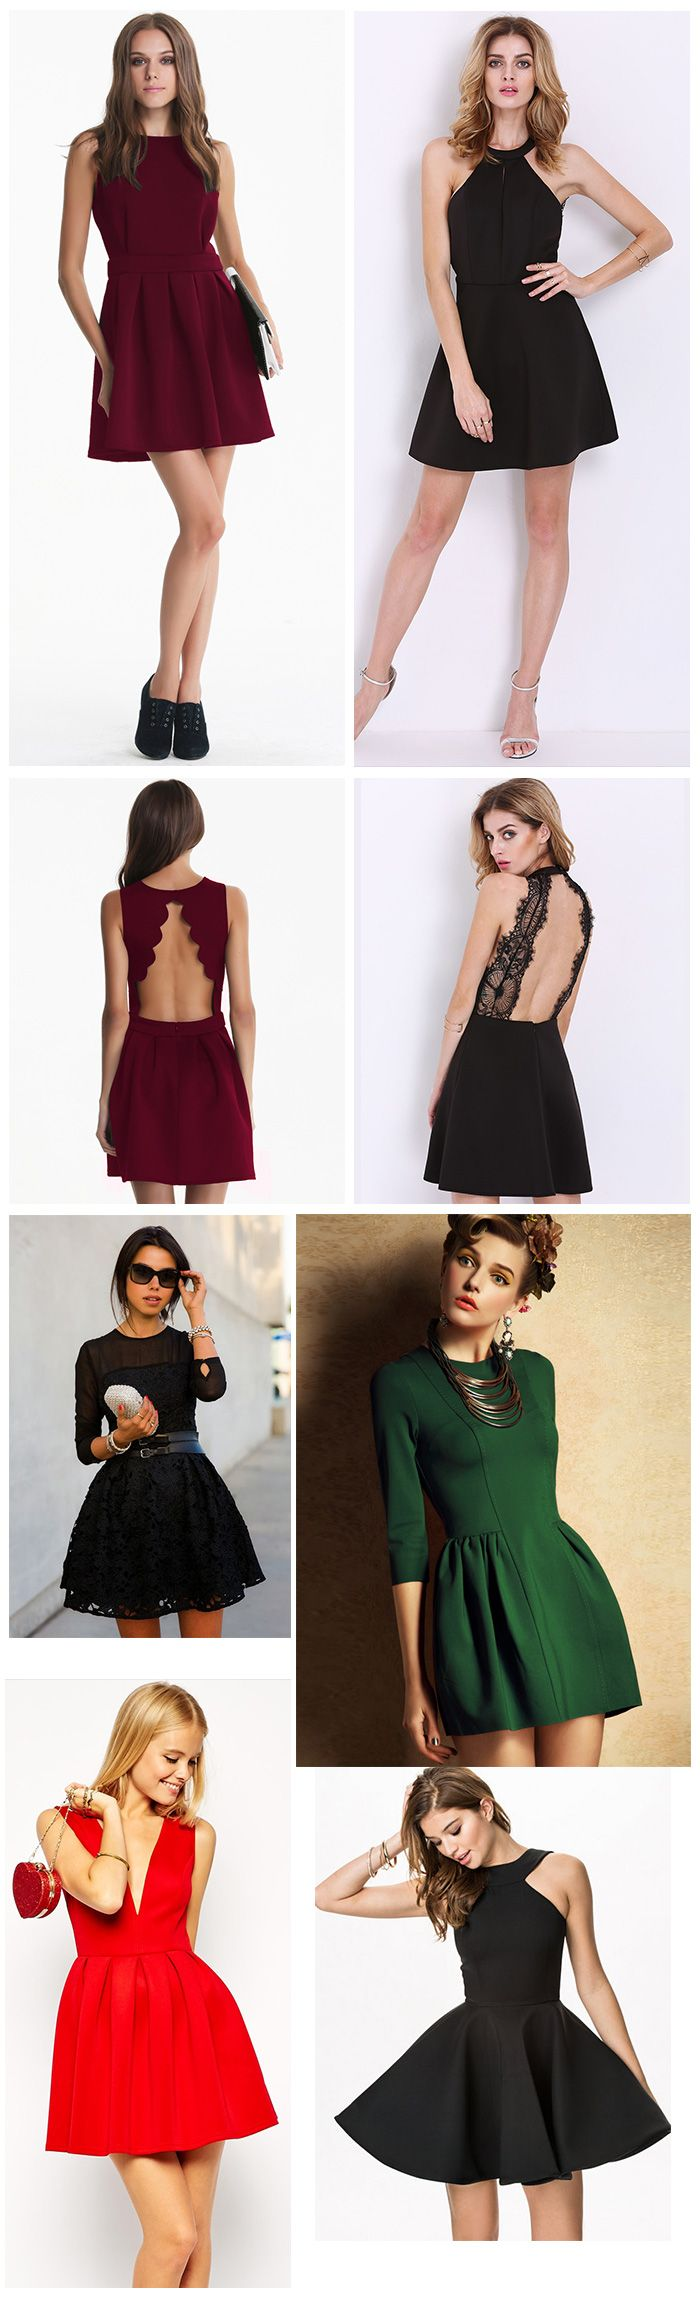 A Line Flare Dresses, Women Slim Styles | style. | Pinterest ...